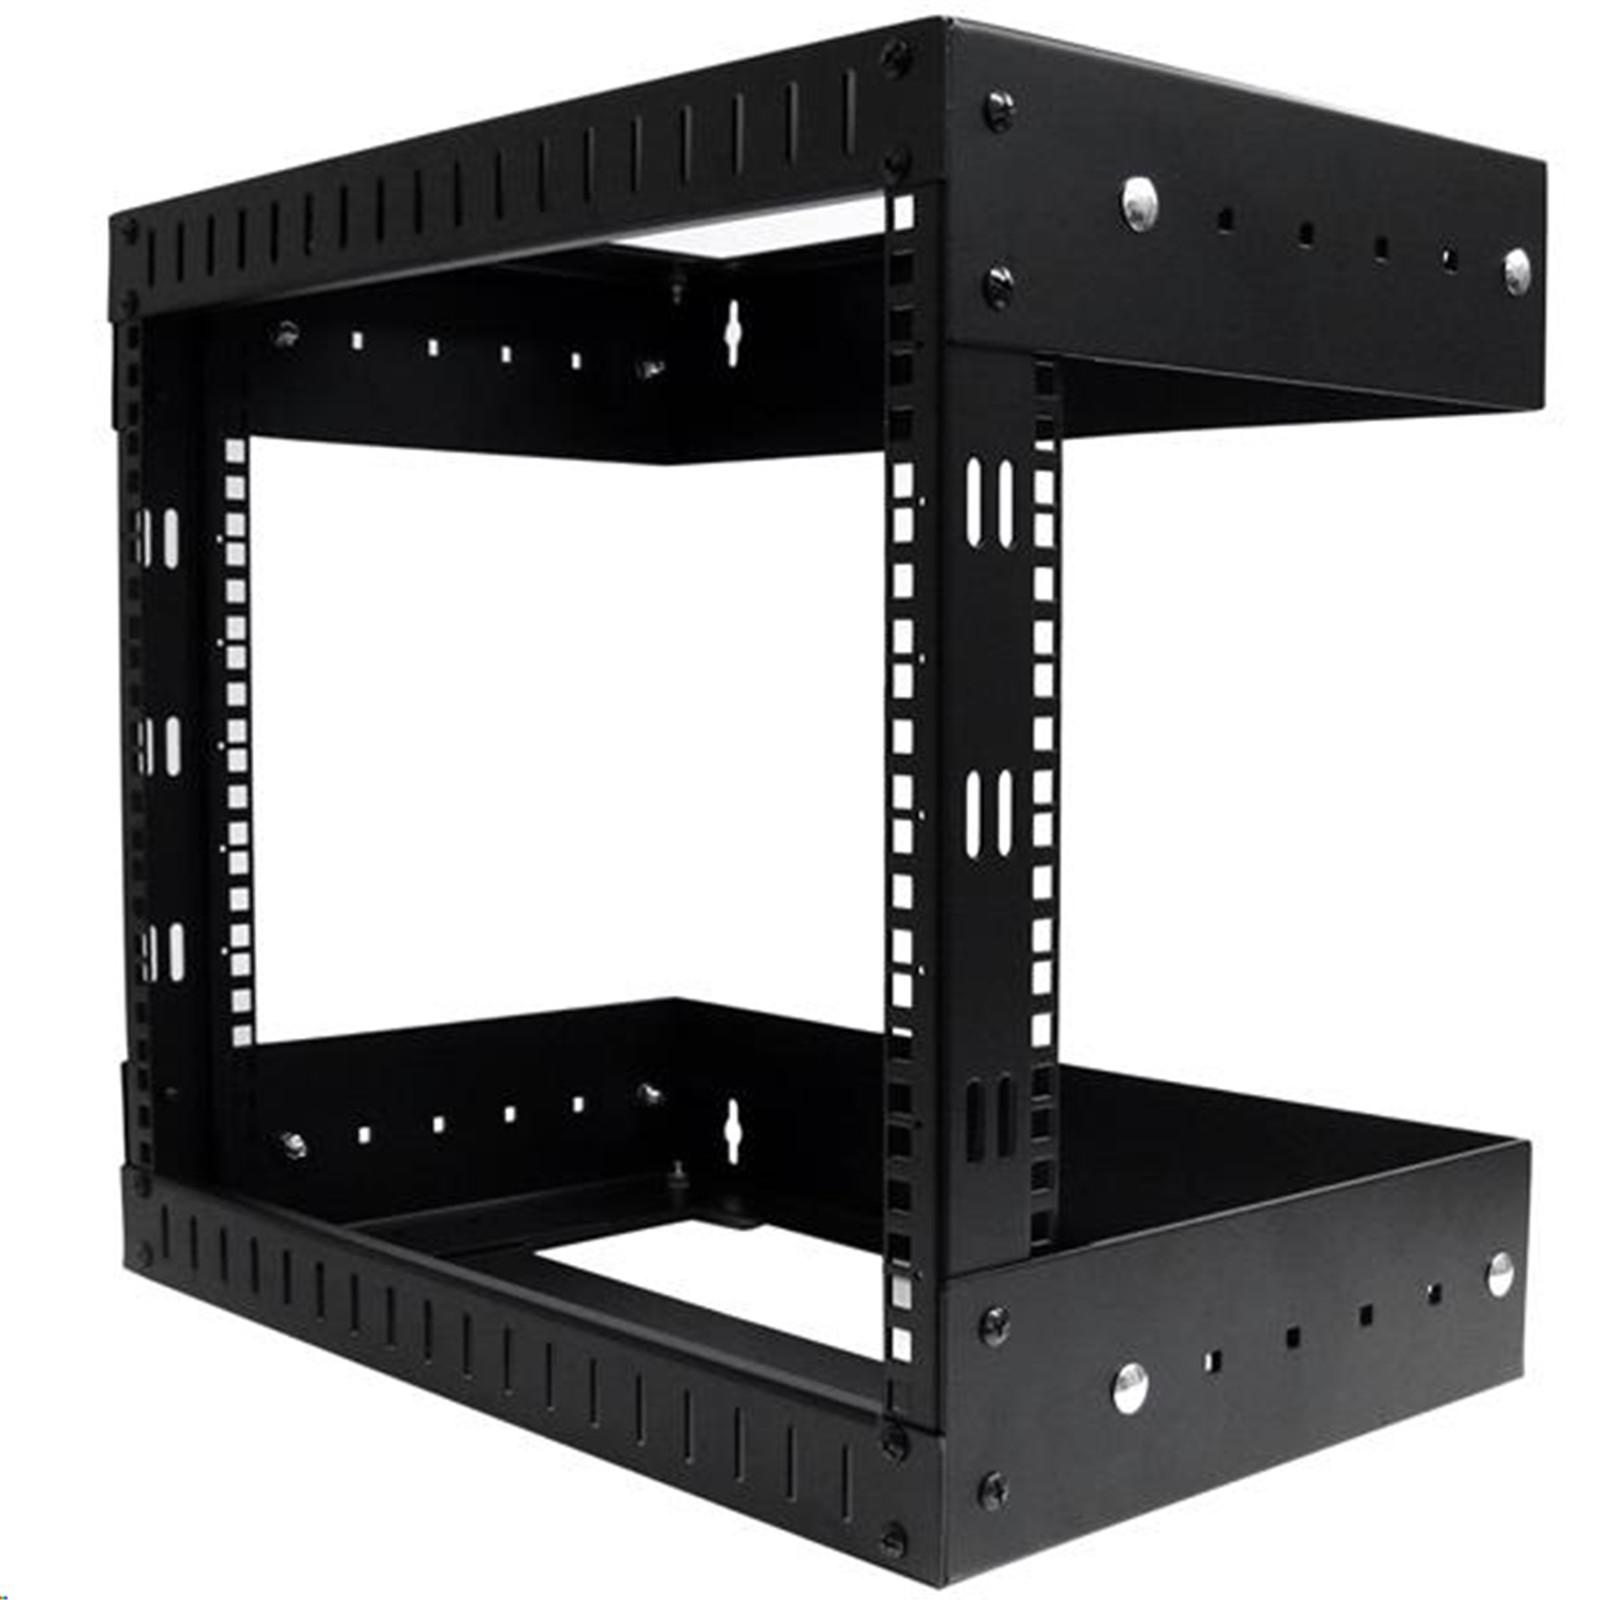 Buy the STARTECH RK812WALLOA 8U Open Frame Wall Mount Equipment Rack ...